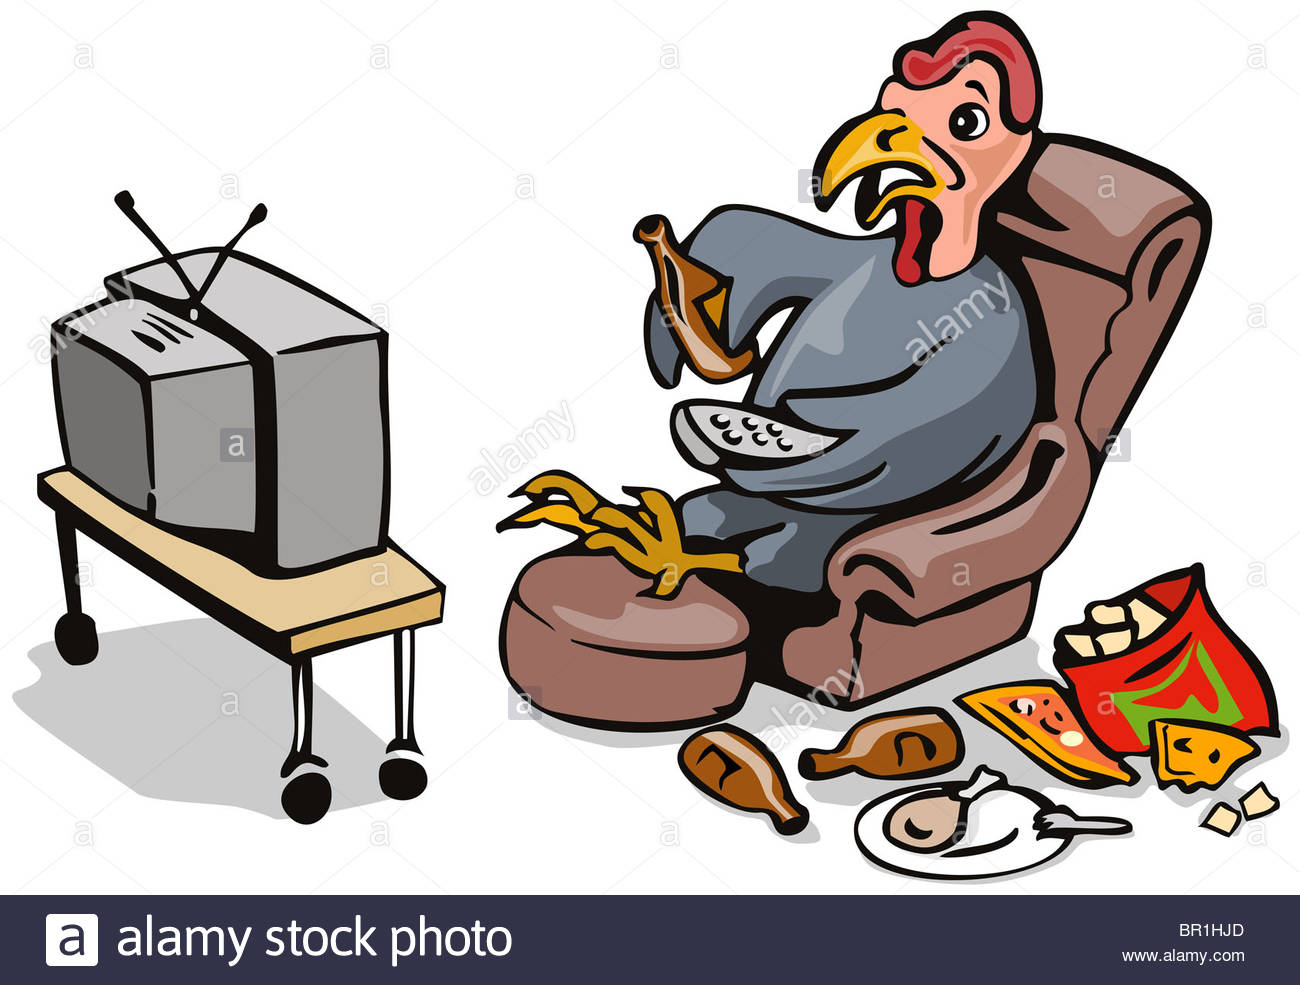 Cartoon Illustration Of A Lazy Couch Potato Turkey Drinking Beer.